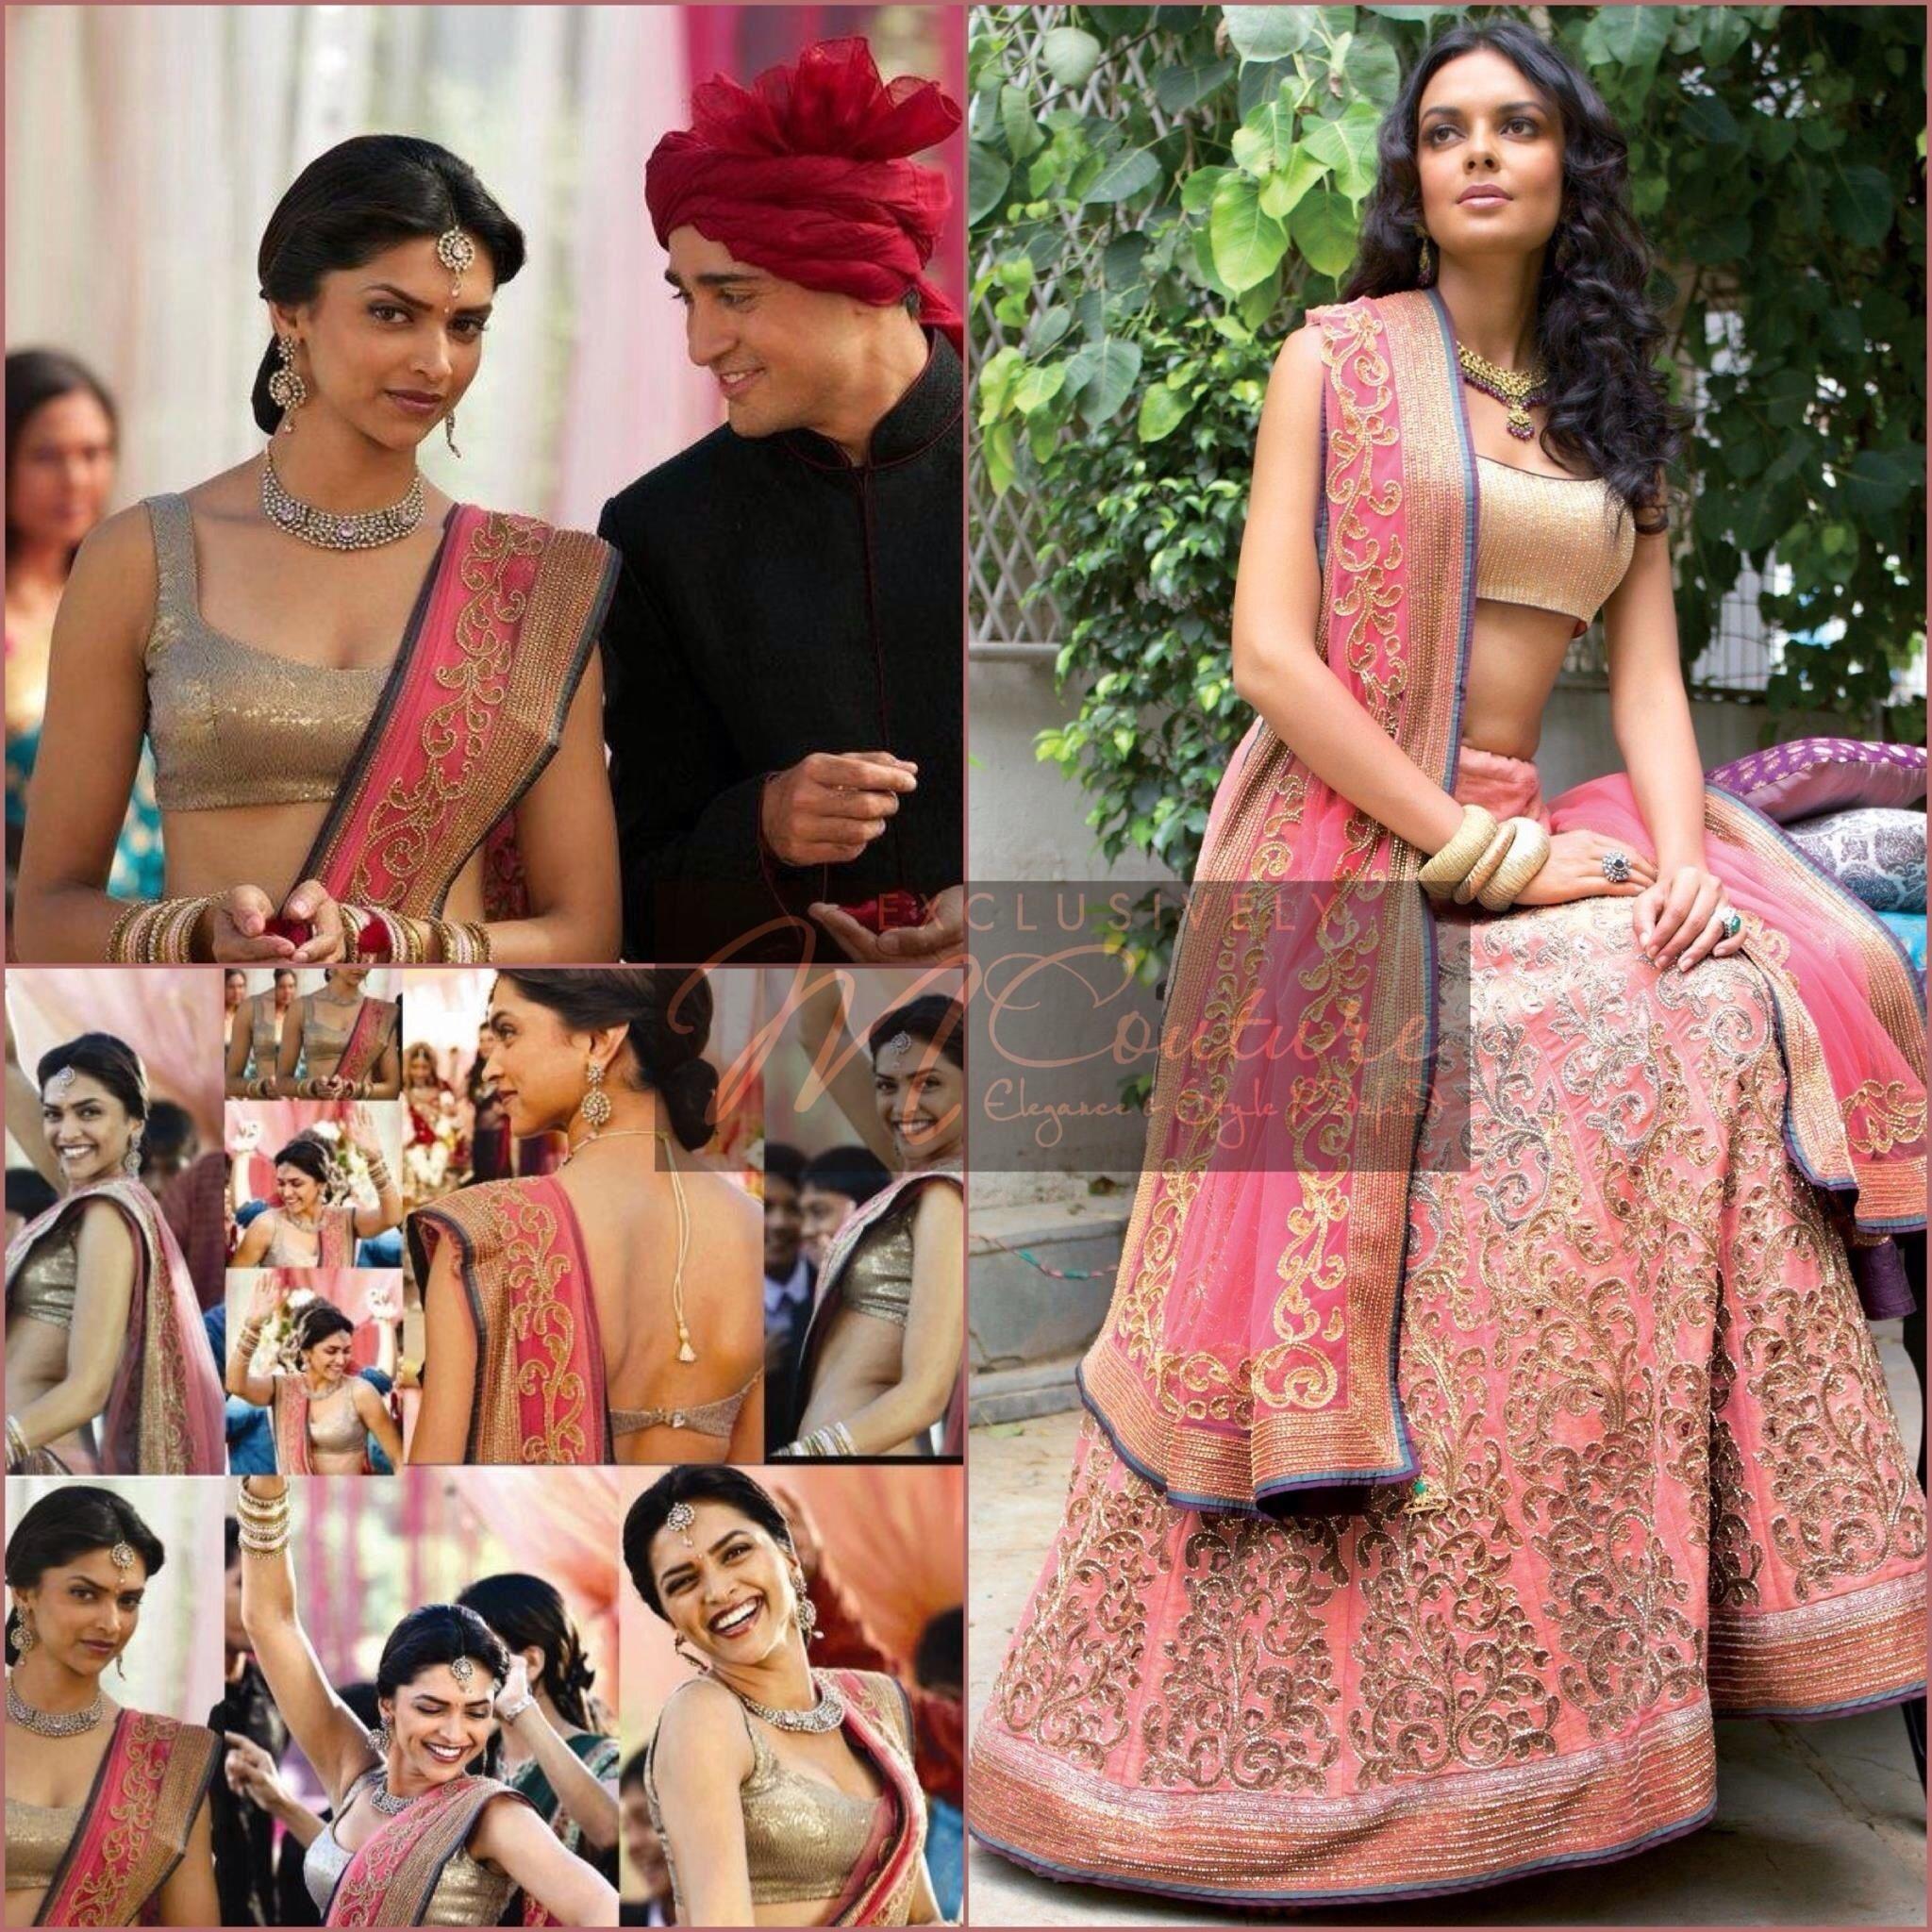 Mounika and Karishma. Deepika Padukone in Break Ke Baad ...